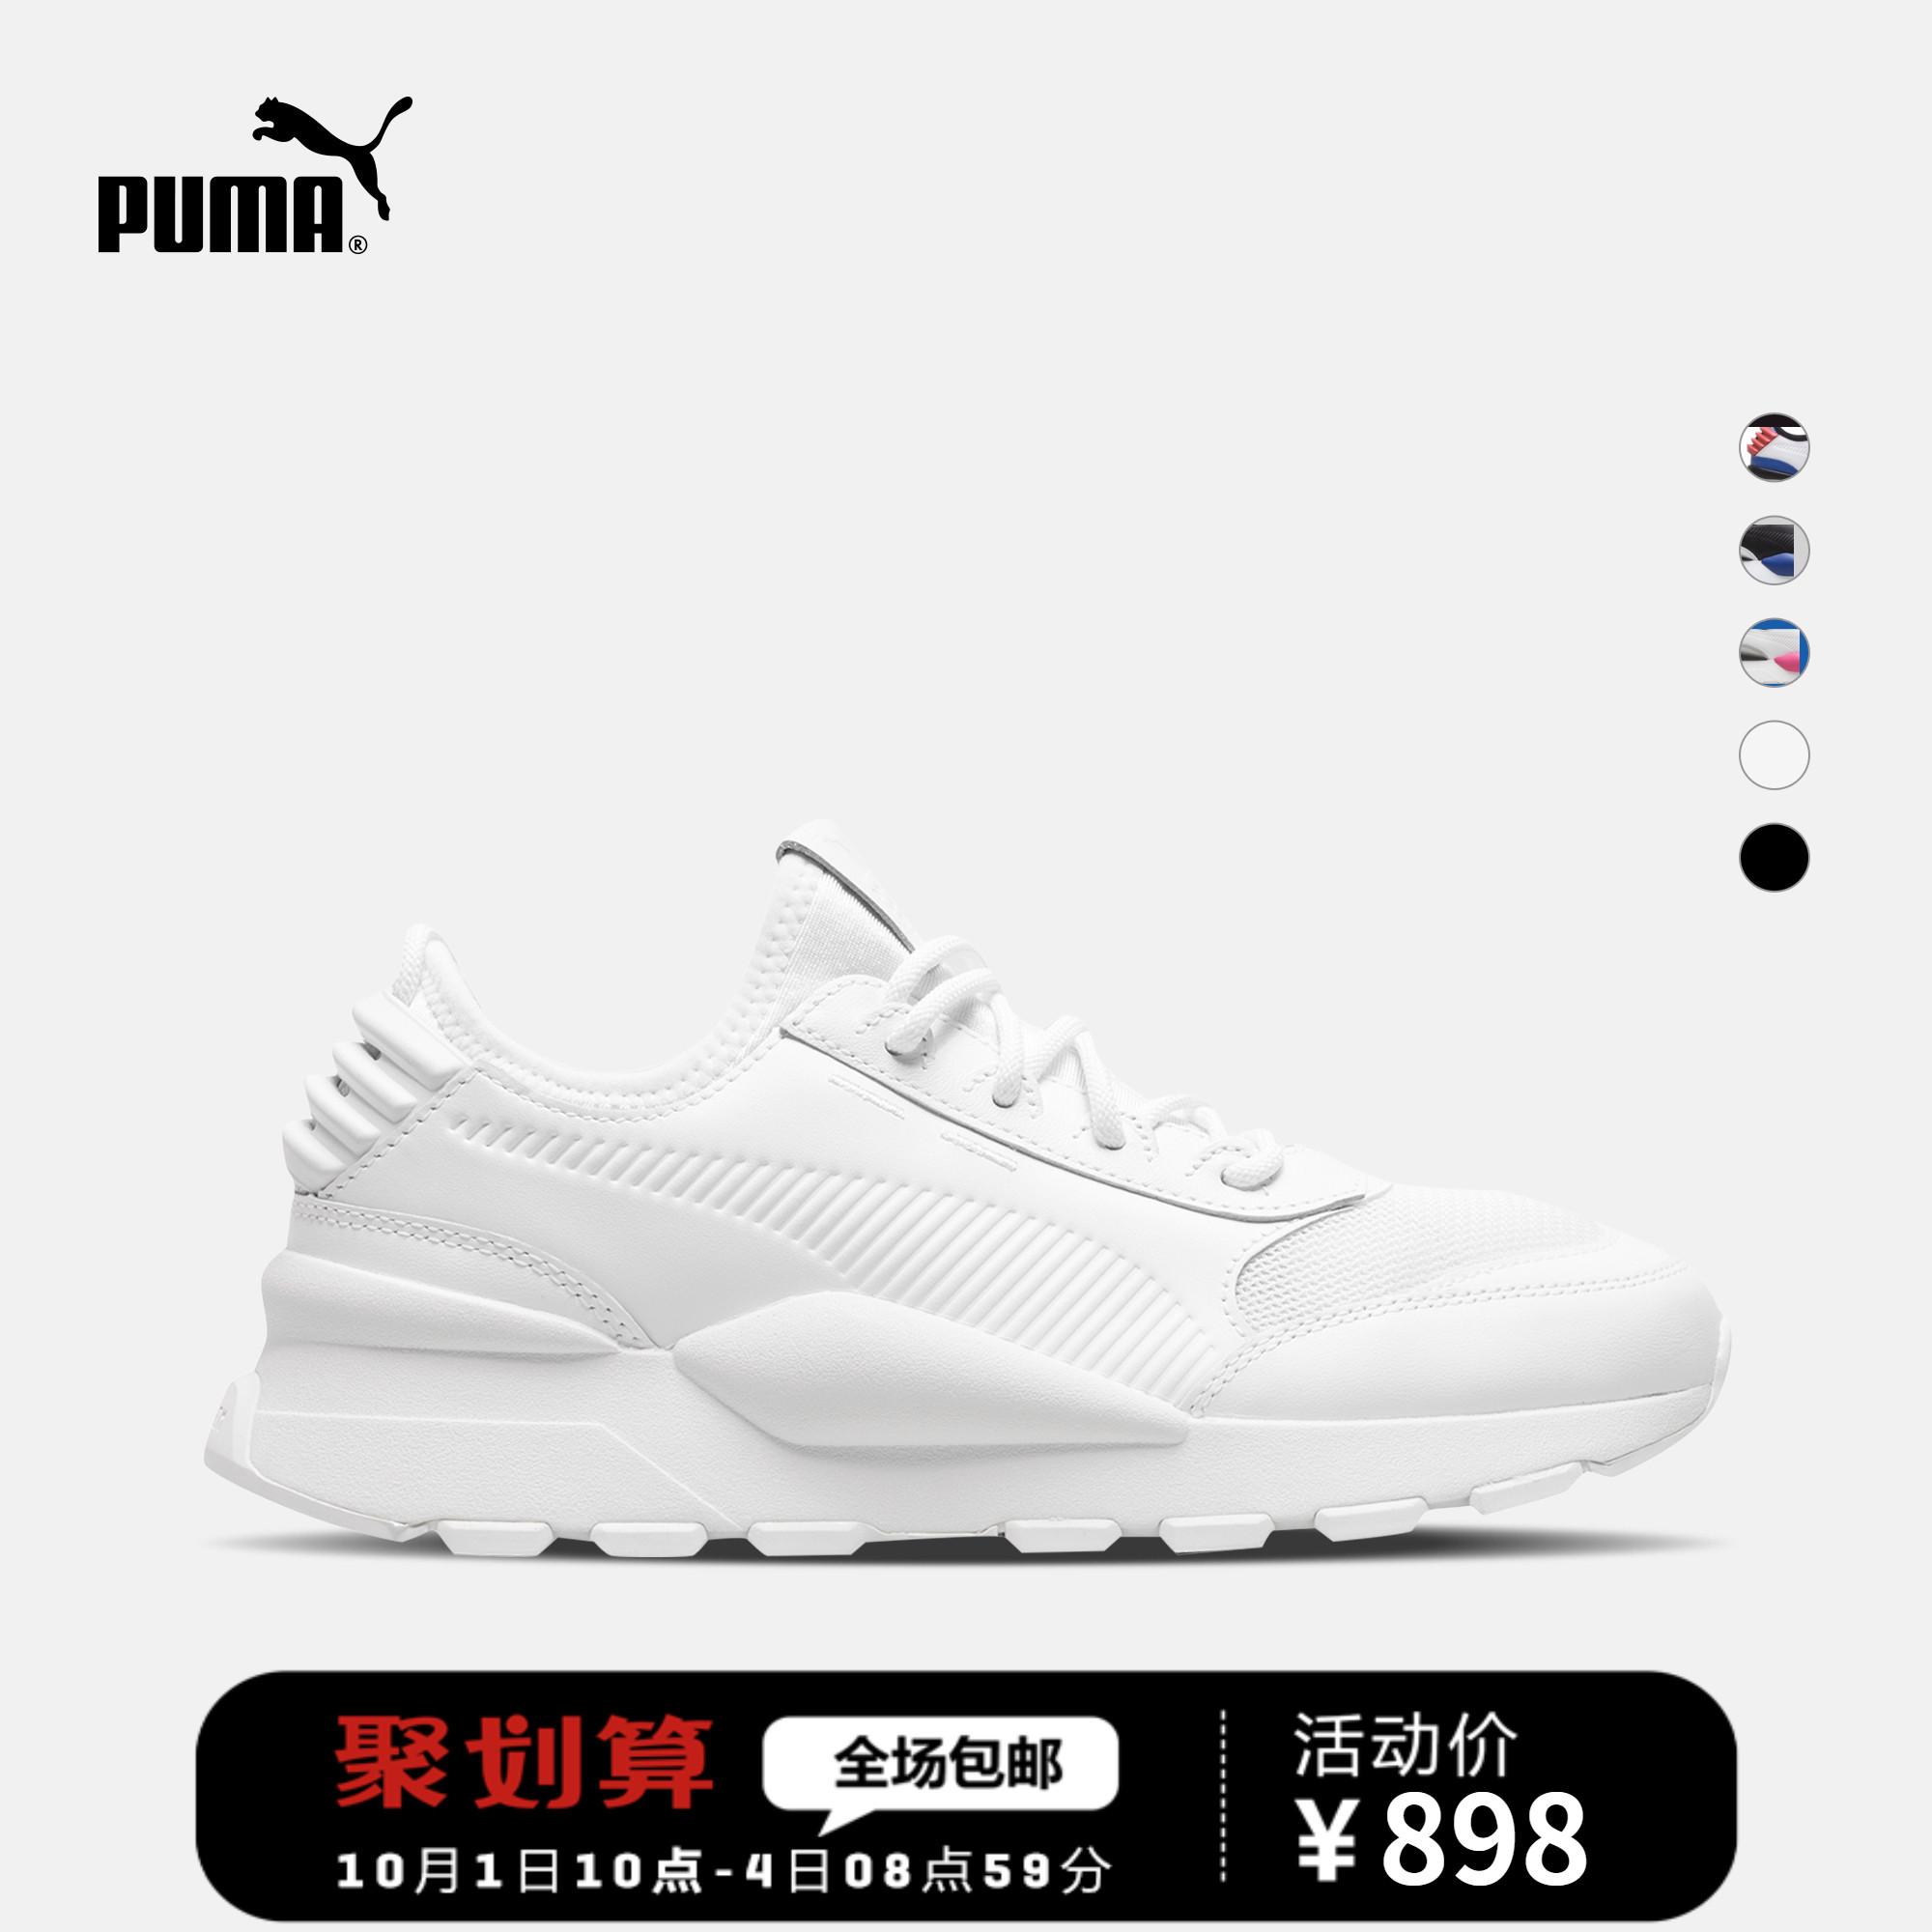 PUMA彪马官方 刘昊然同款 男女同款休闲鞋 RS-0 SOUND 366890